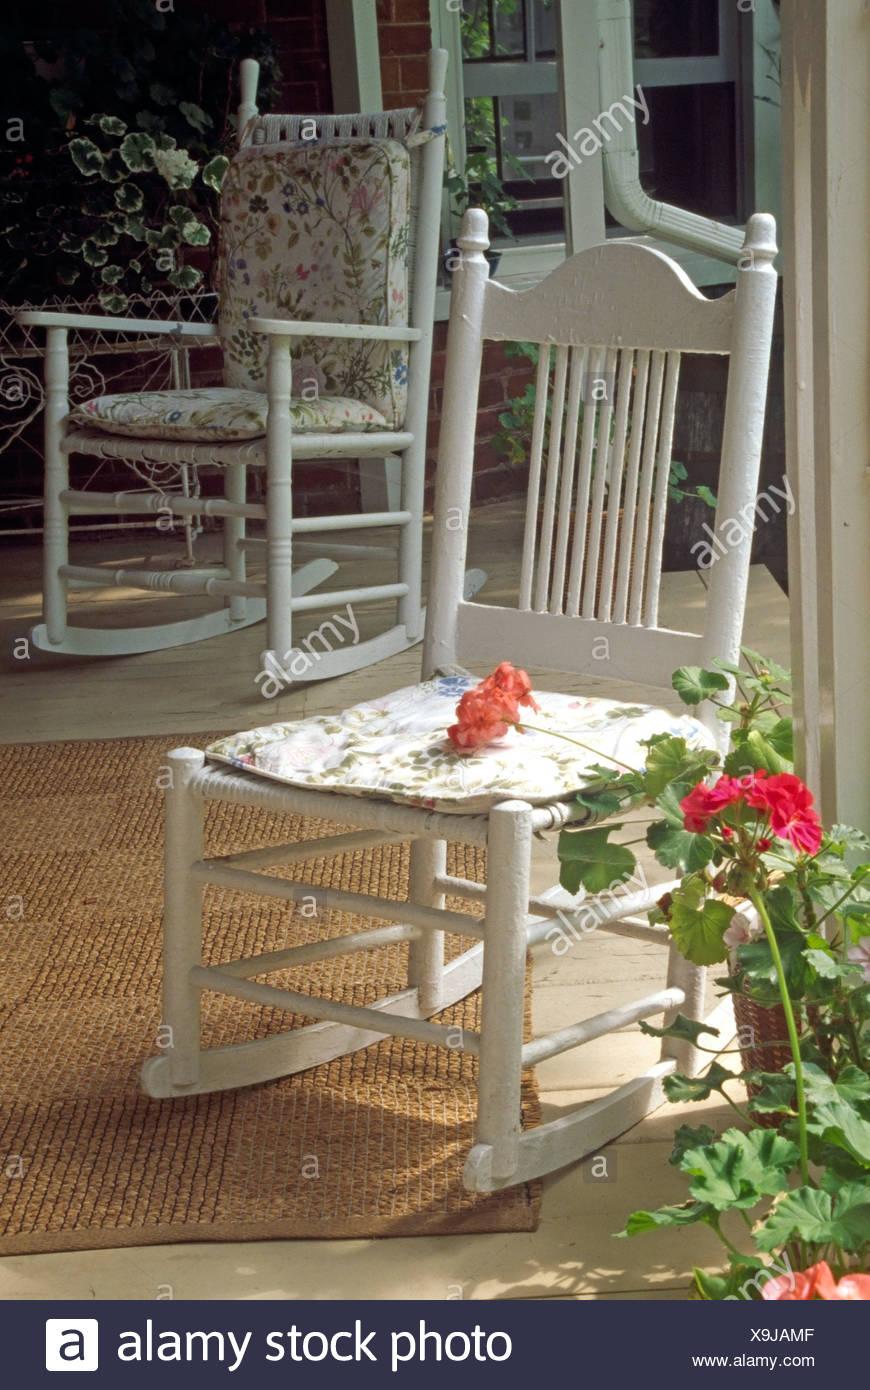 Strange Rocking Chairs On Country Porch Stock Photo 281301343 Alamy Inzonedesignstudio Interior Chair Design Inzonedesignstudiocom